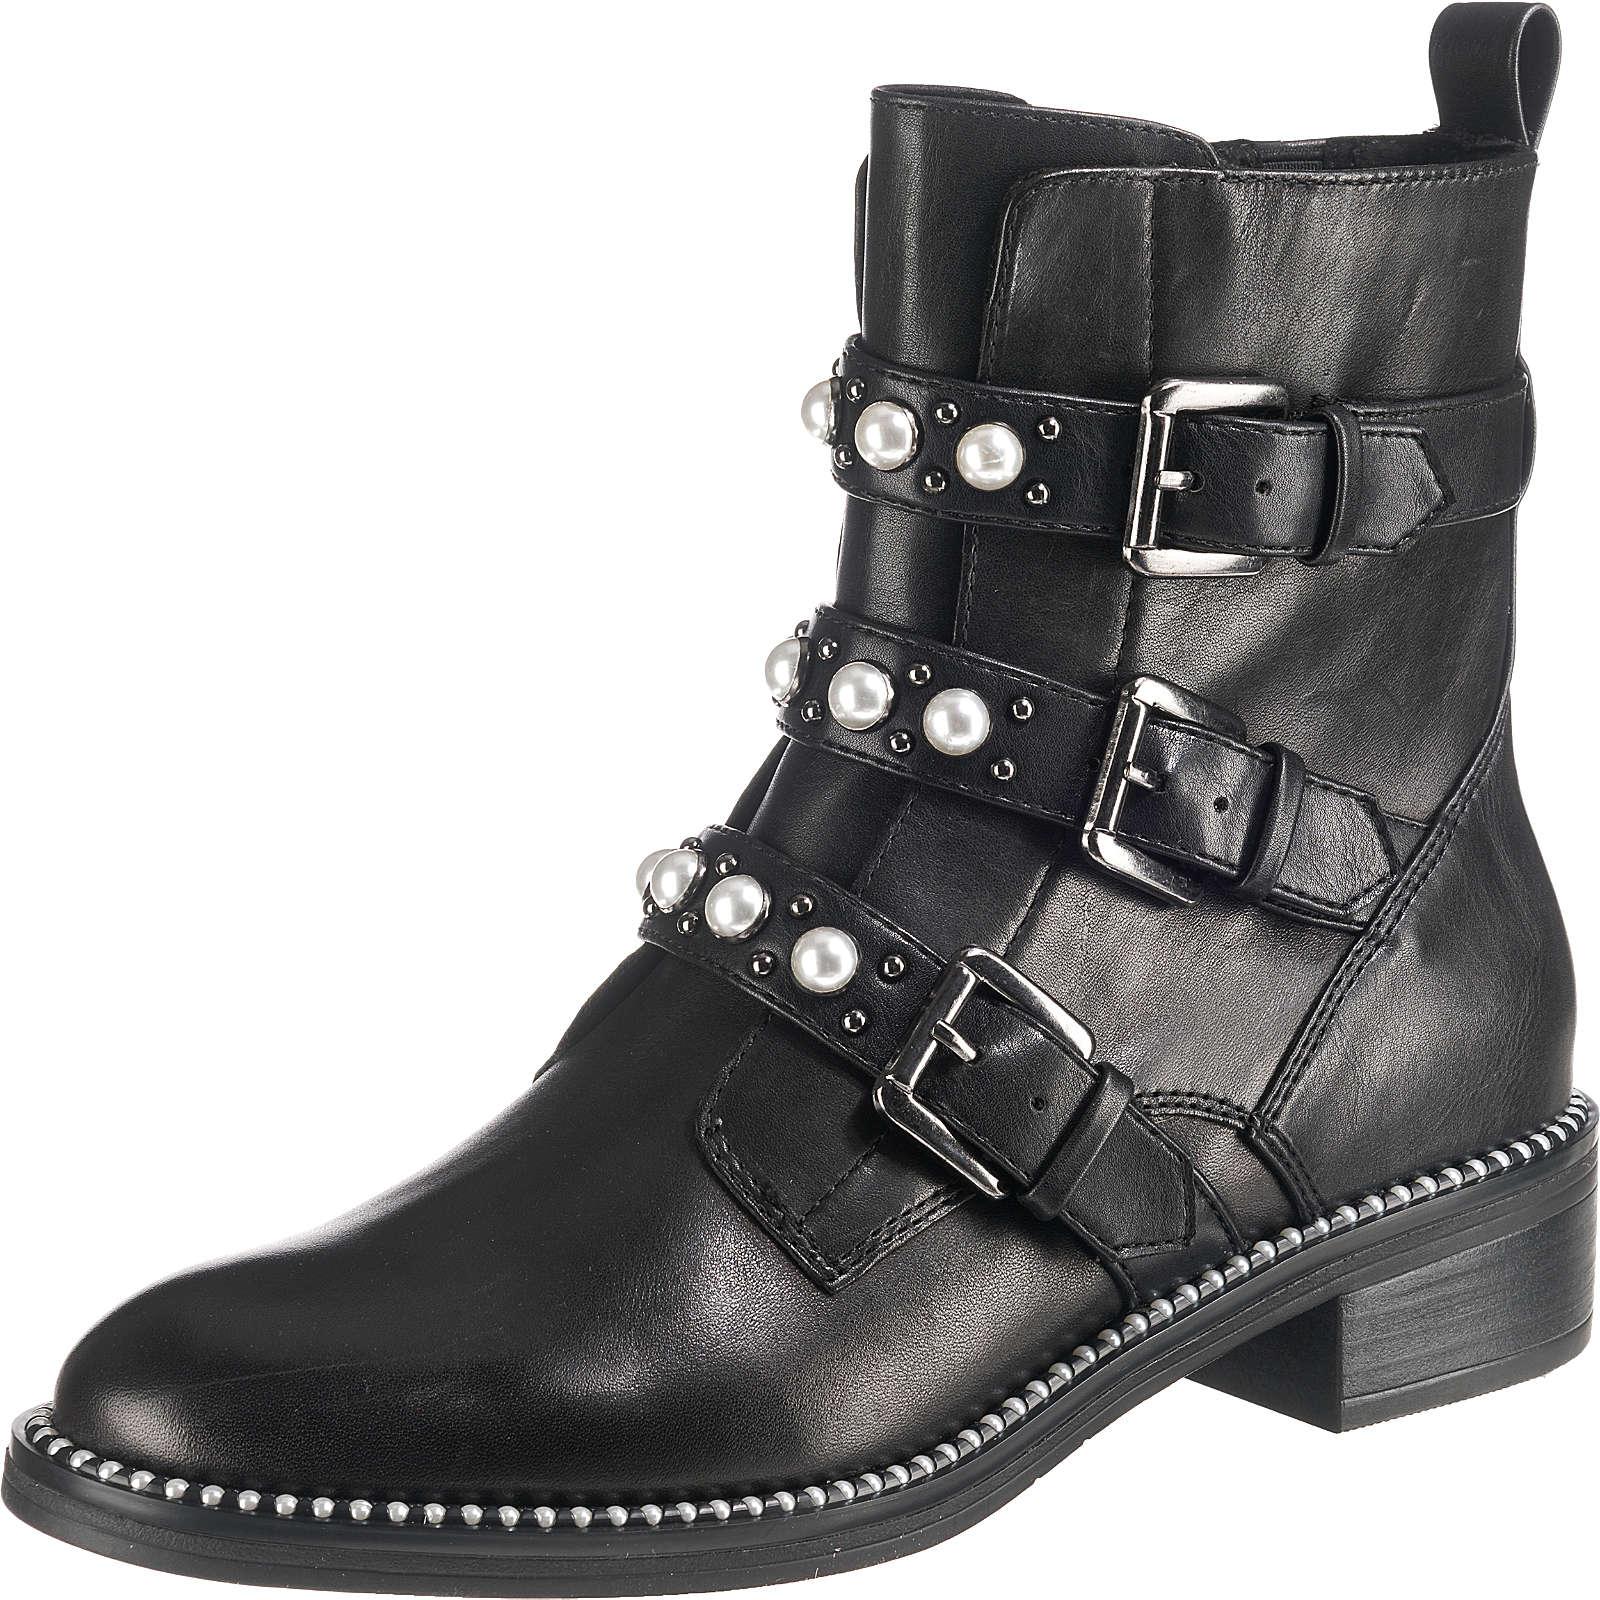 Tamaris Biker Boots schwarz Damen Gr. 37